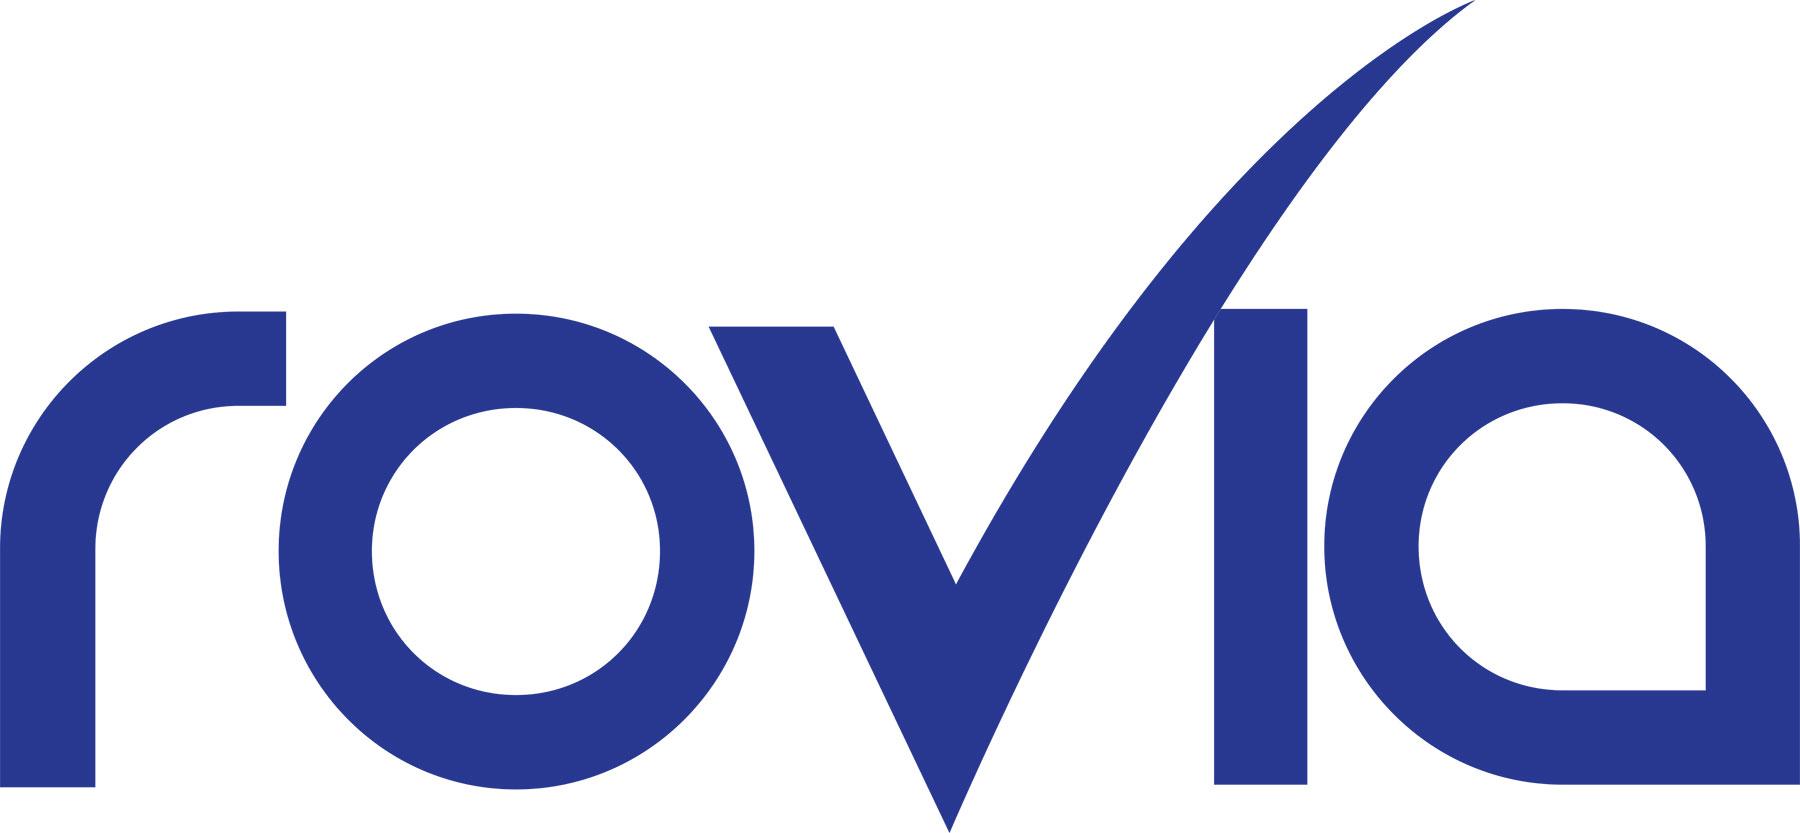 Rovia_logo.jpg